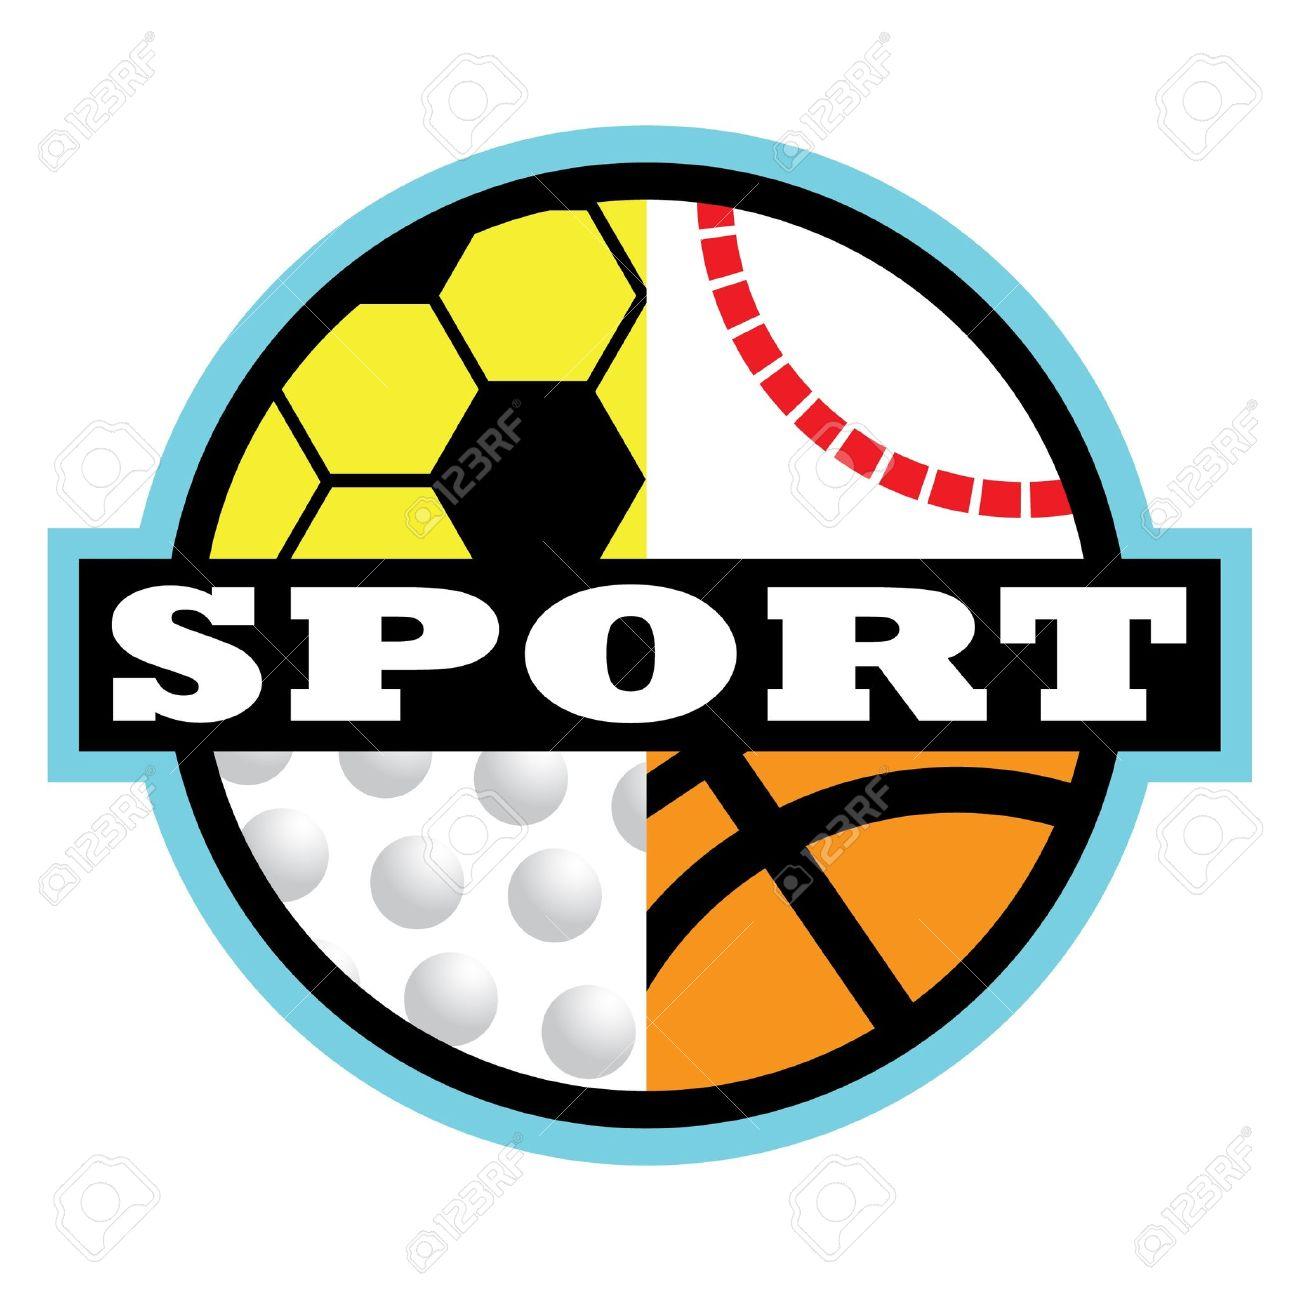 image logo sport